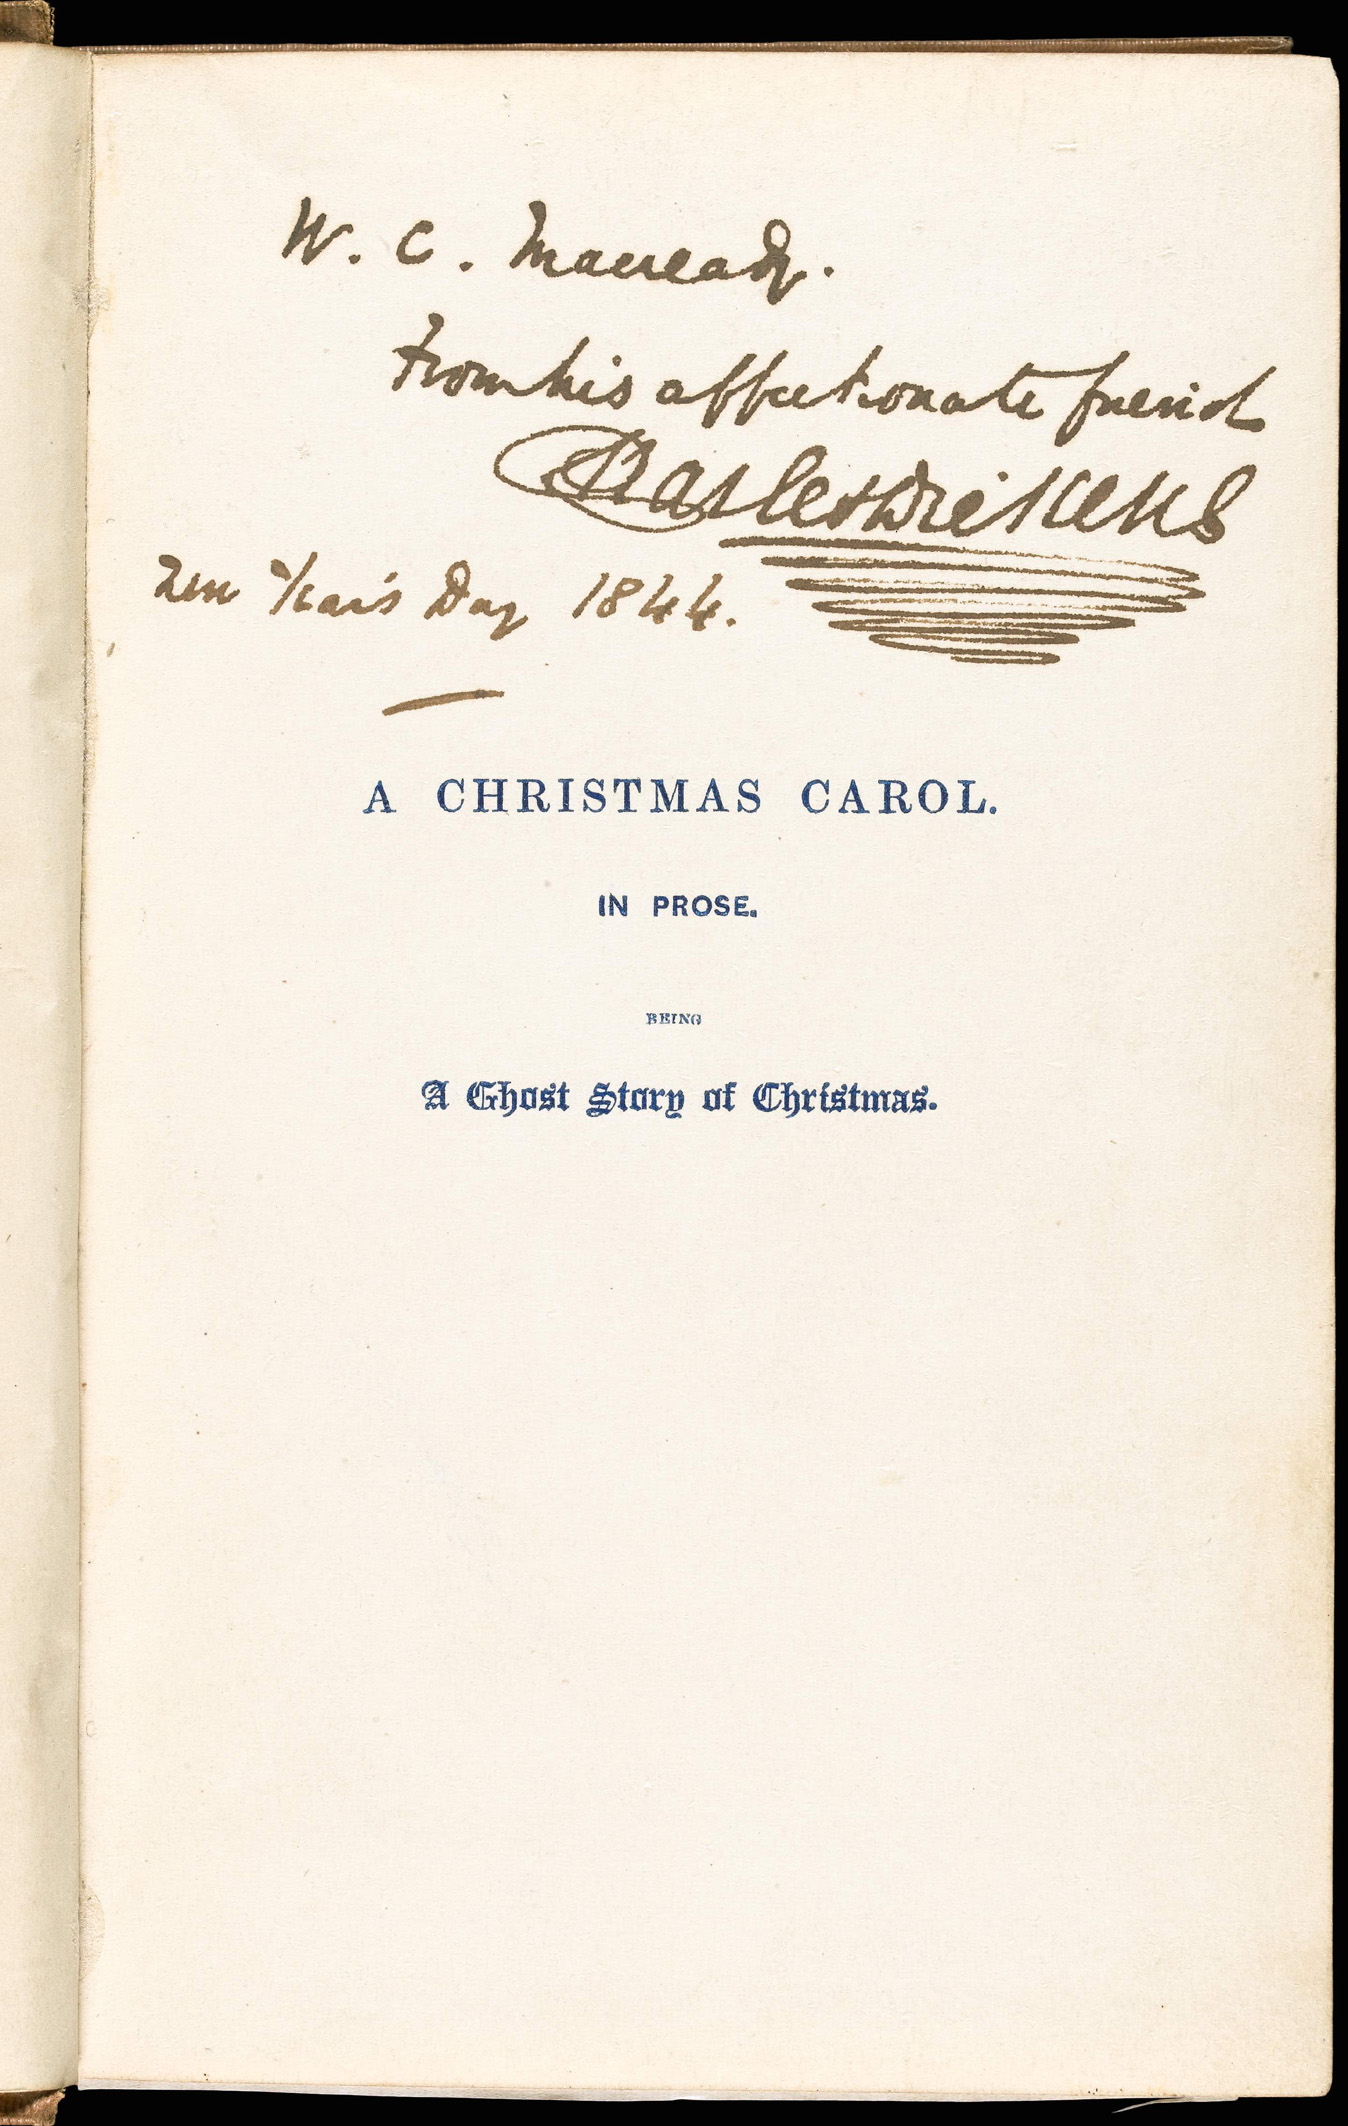 RARE FIRST EDITION LITERATURE ATTRACTS WORLDWIDE BIDS « antiquesandartireland.com